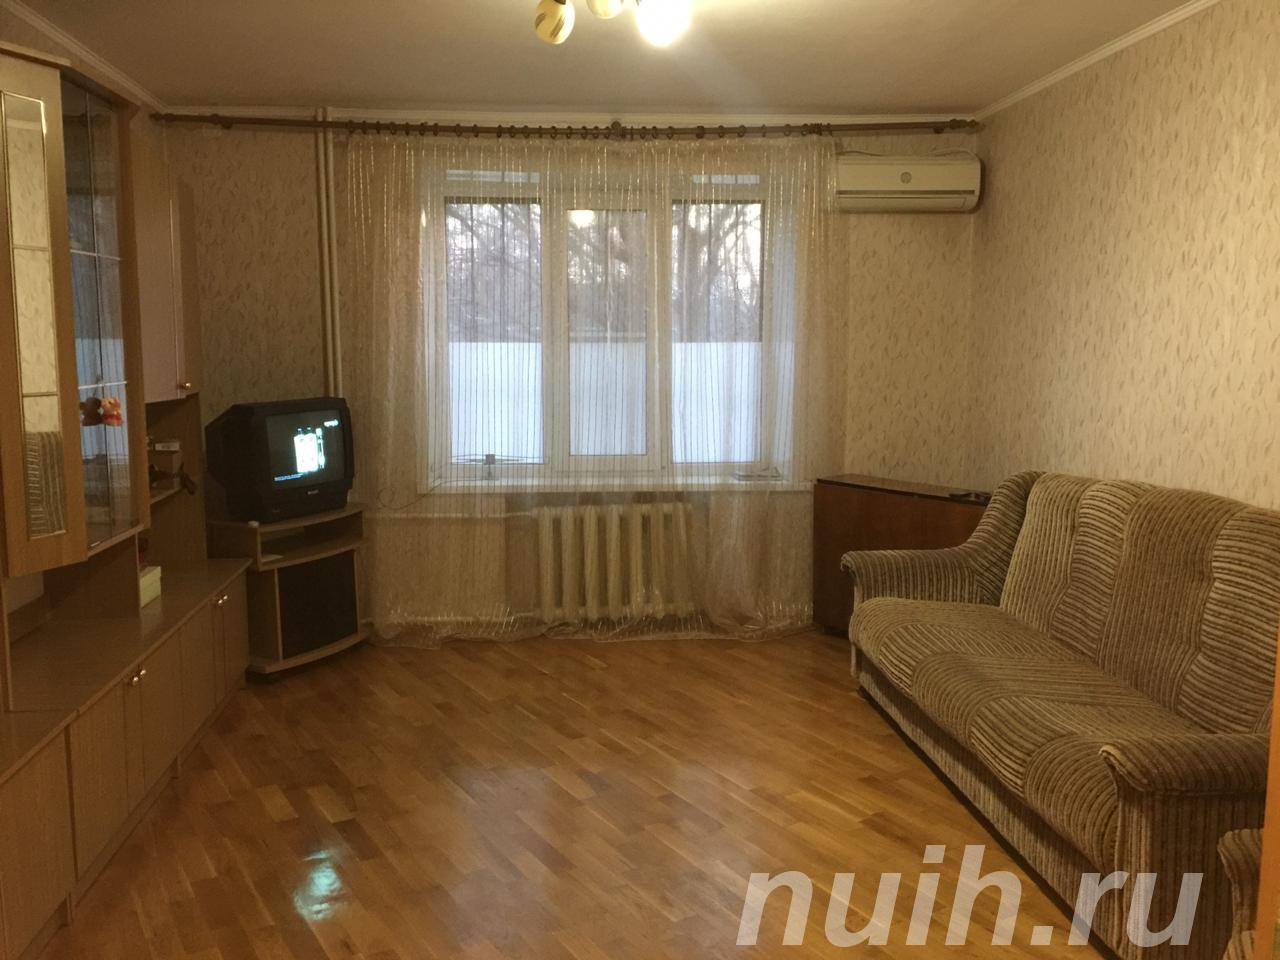 Продаю 2-комнатная квартиру, 56 кв м,  Краснодар